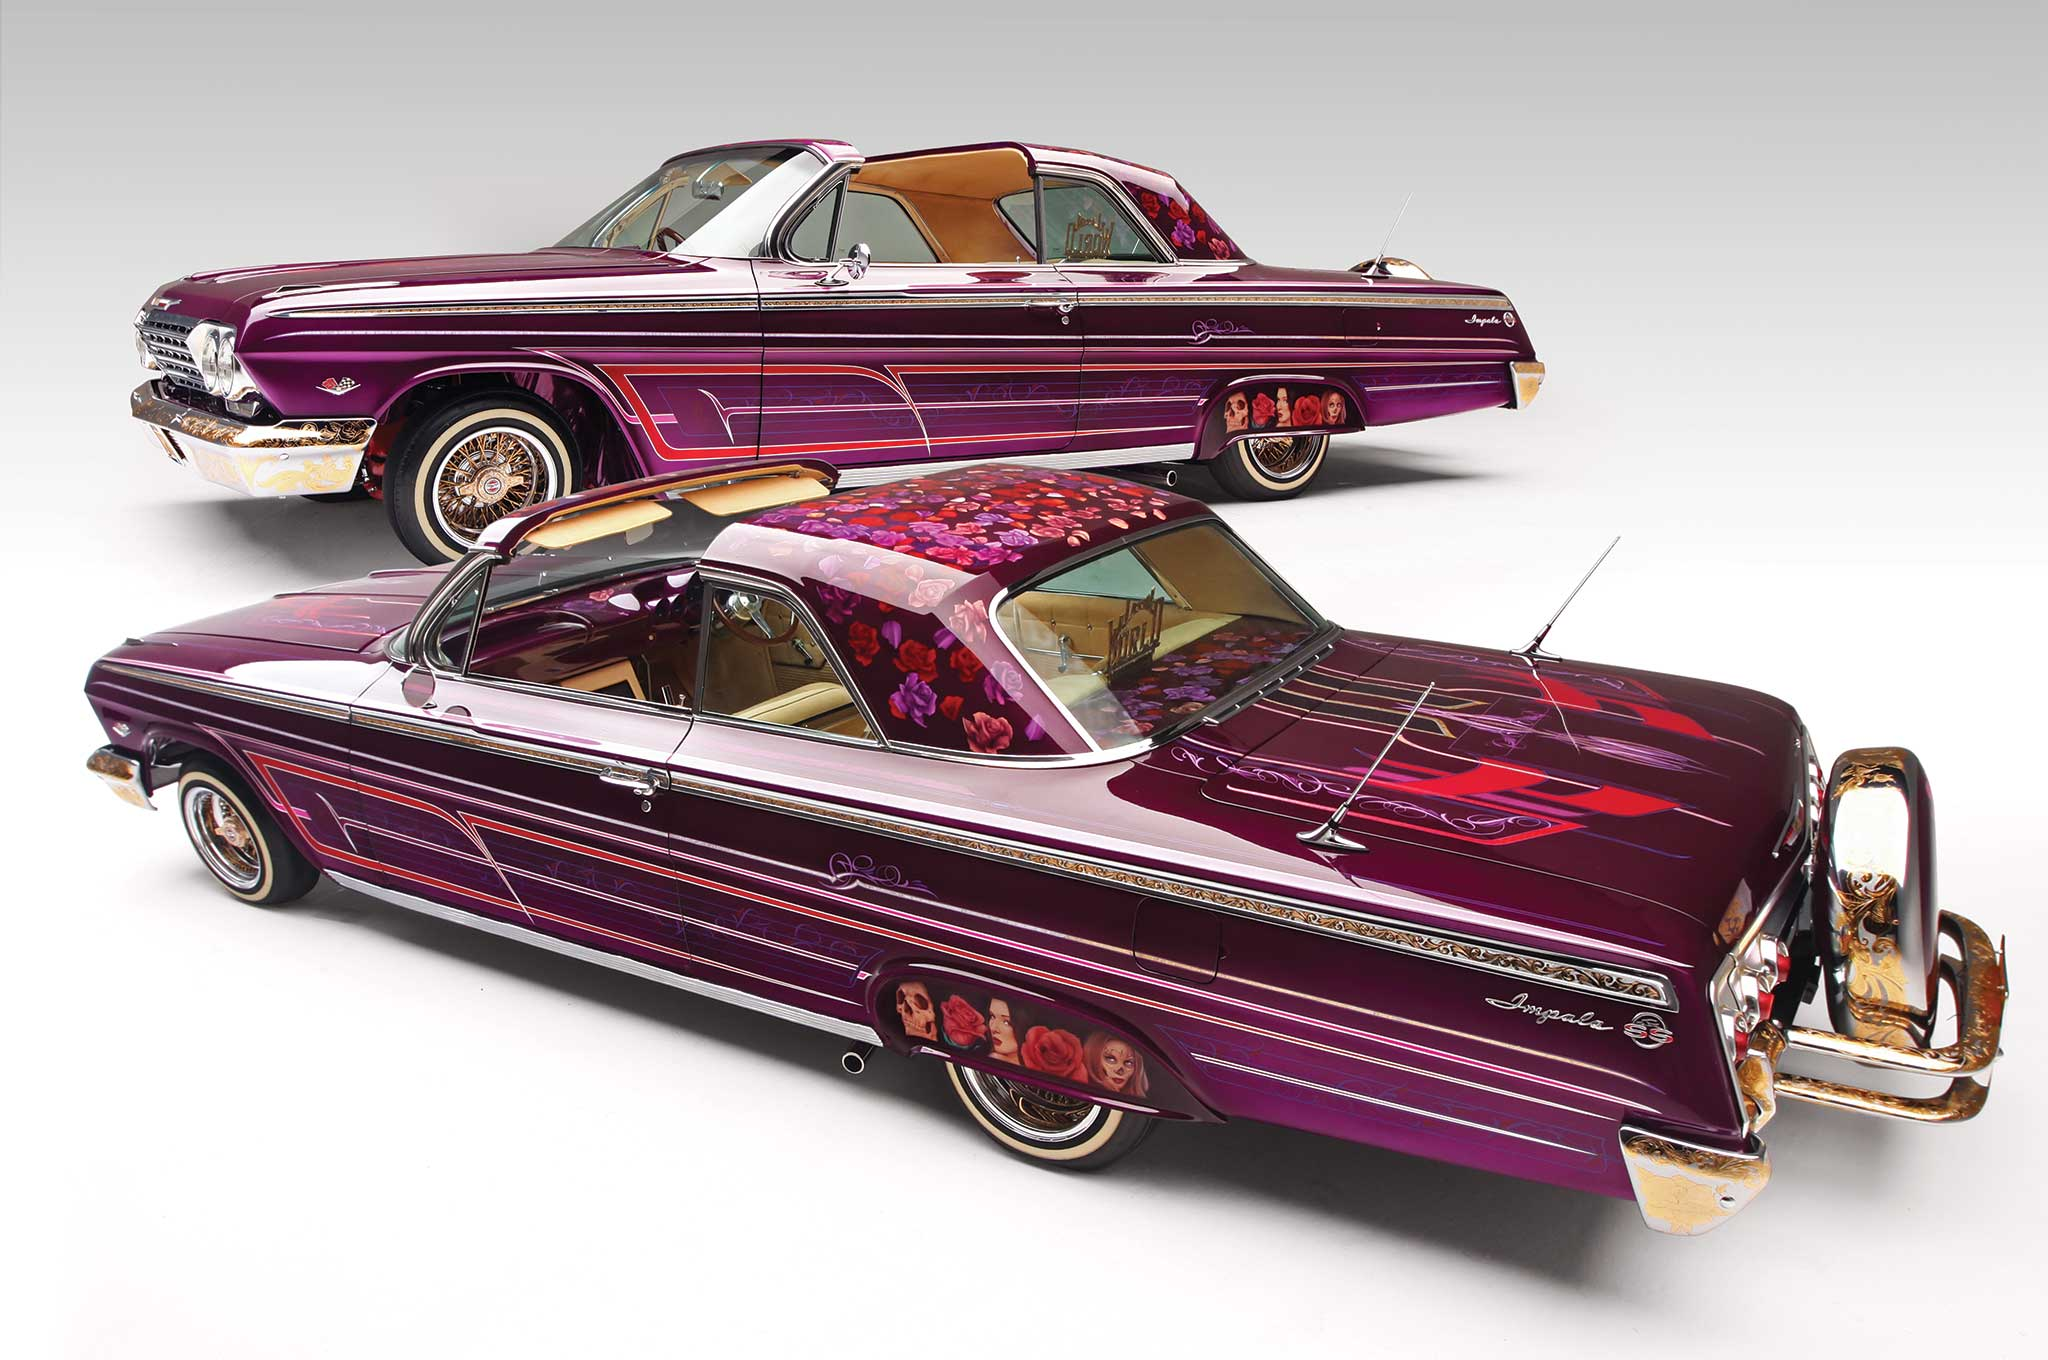 1962 Chevrolet Impala Ss Right Hand Man Lowrider